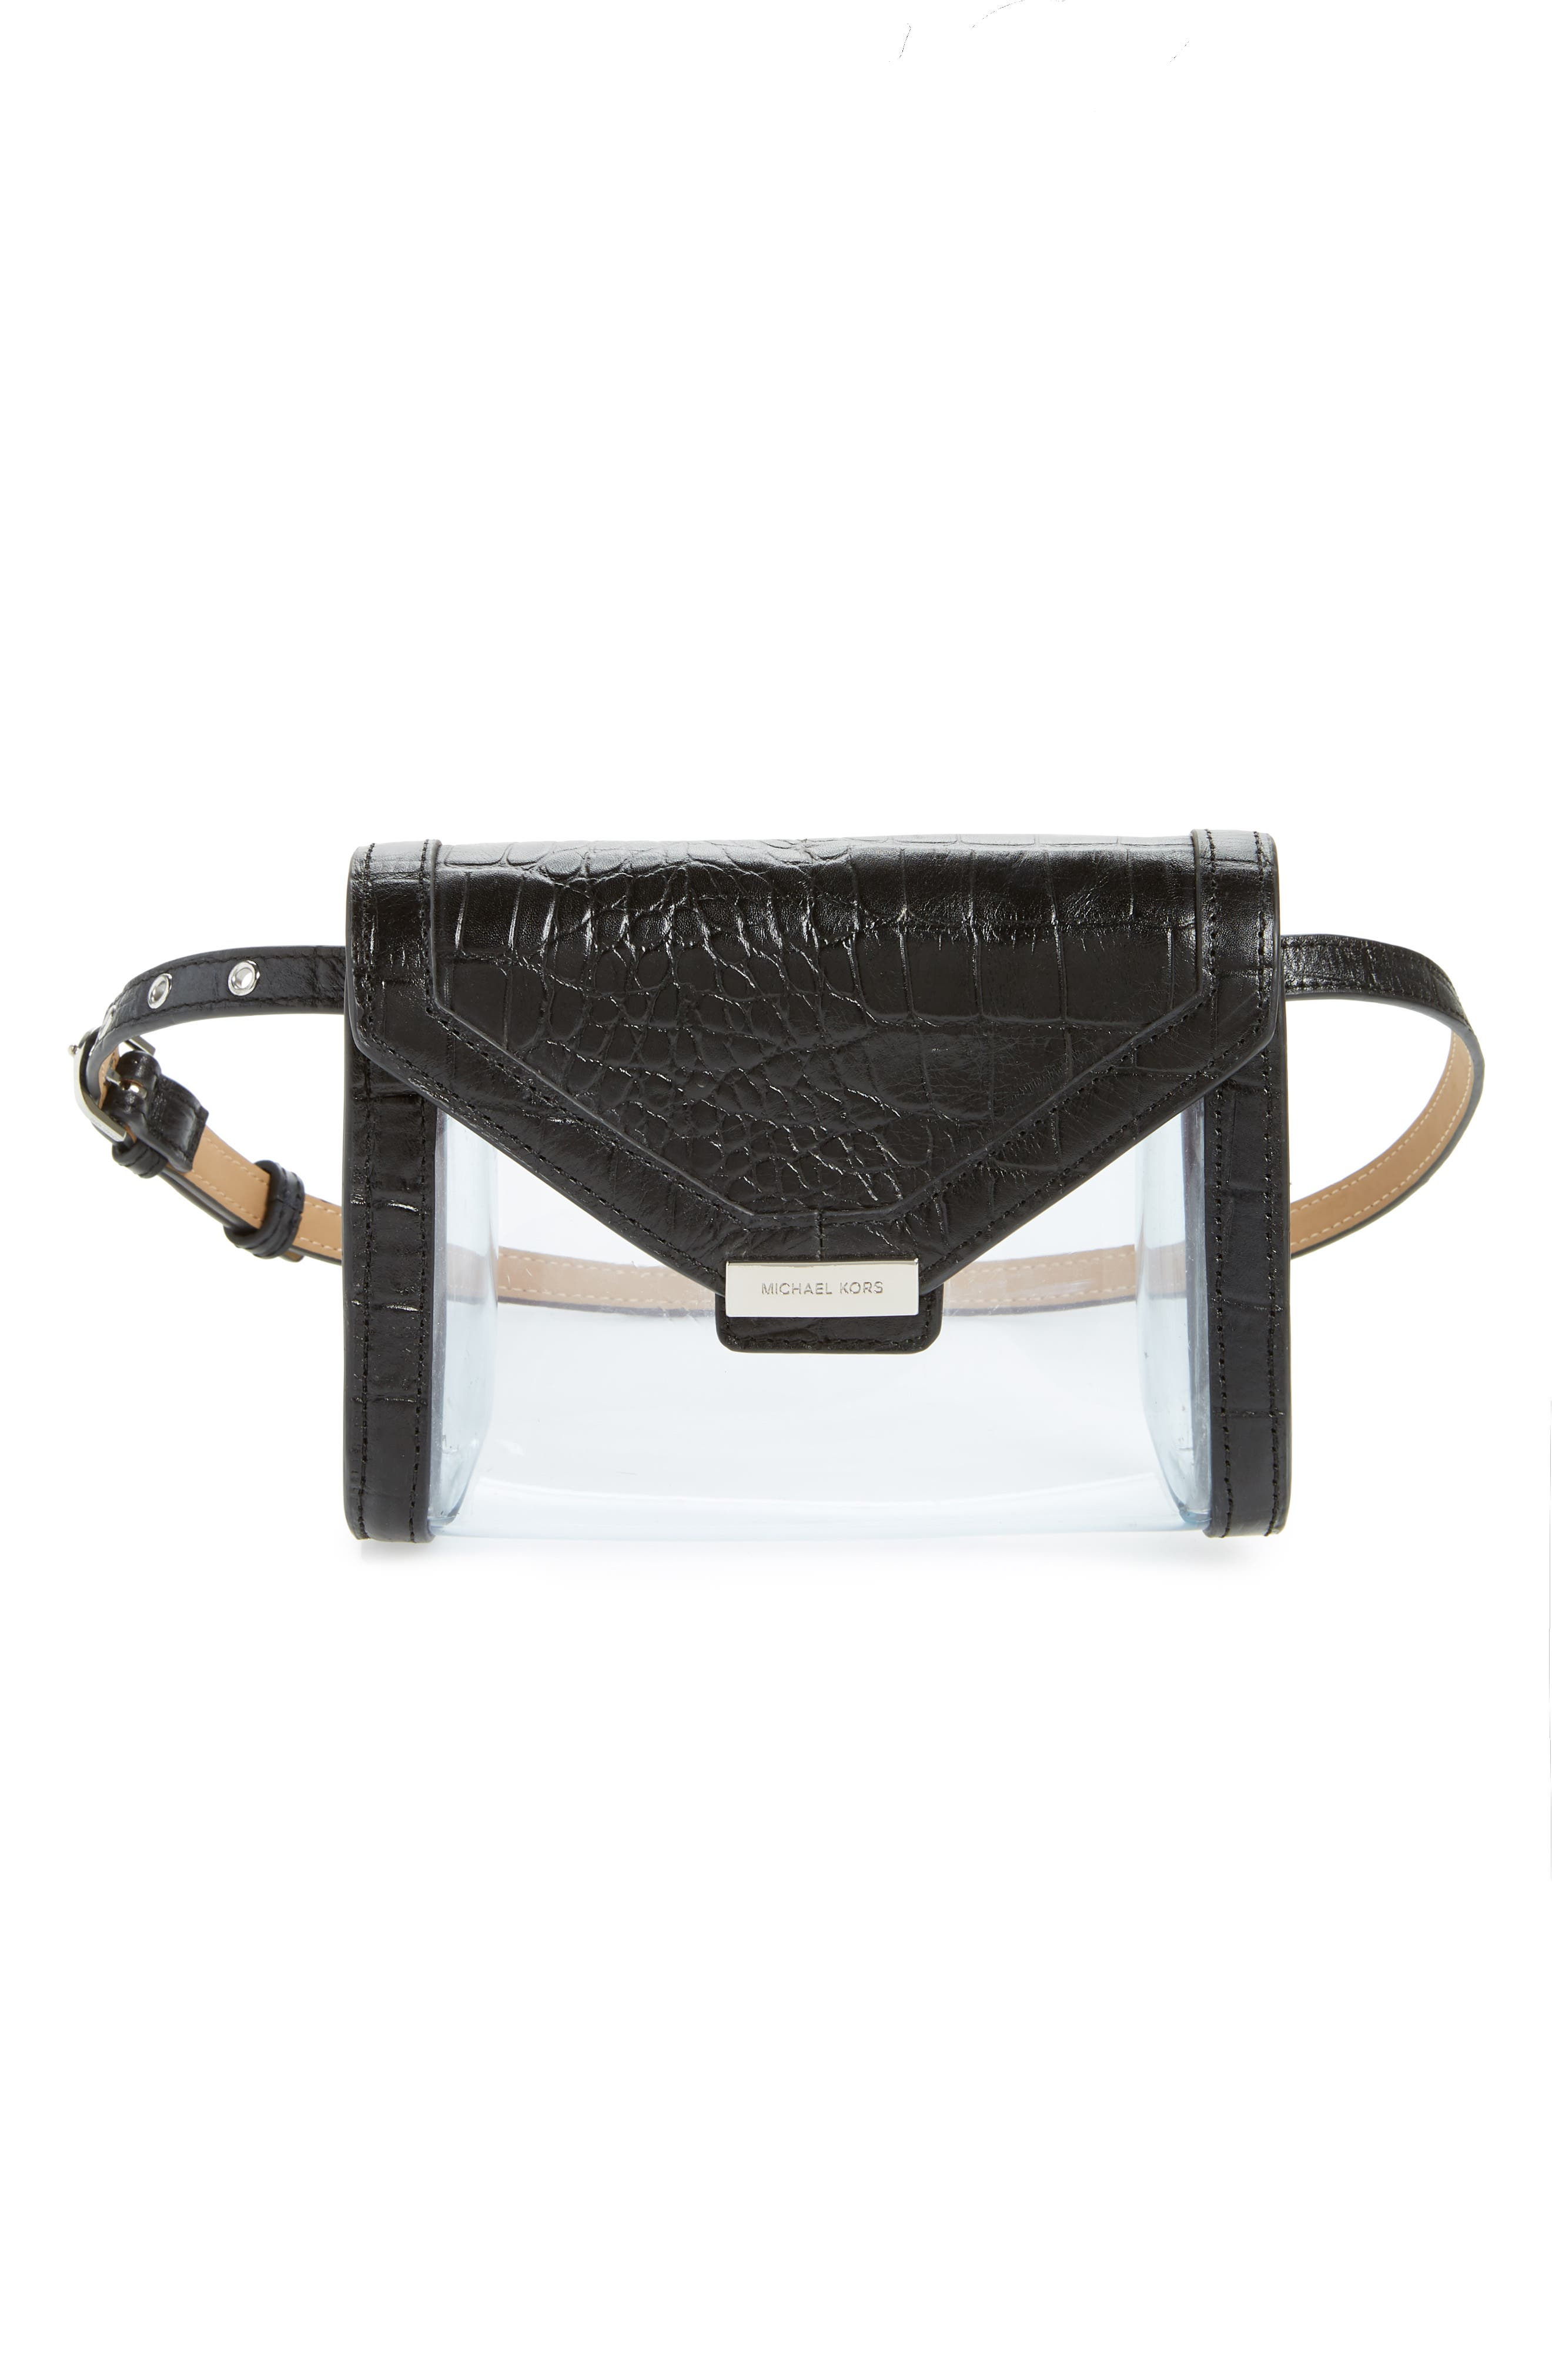 8c6029ae754404 michael kors handbags | Nordstrom